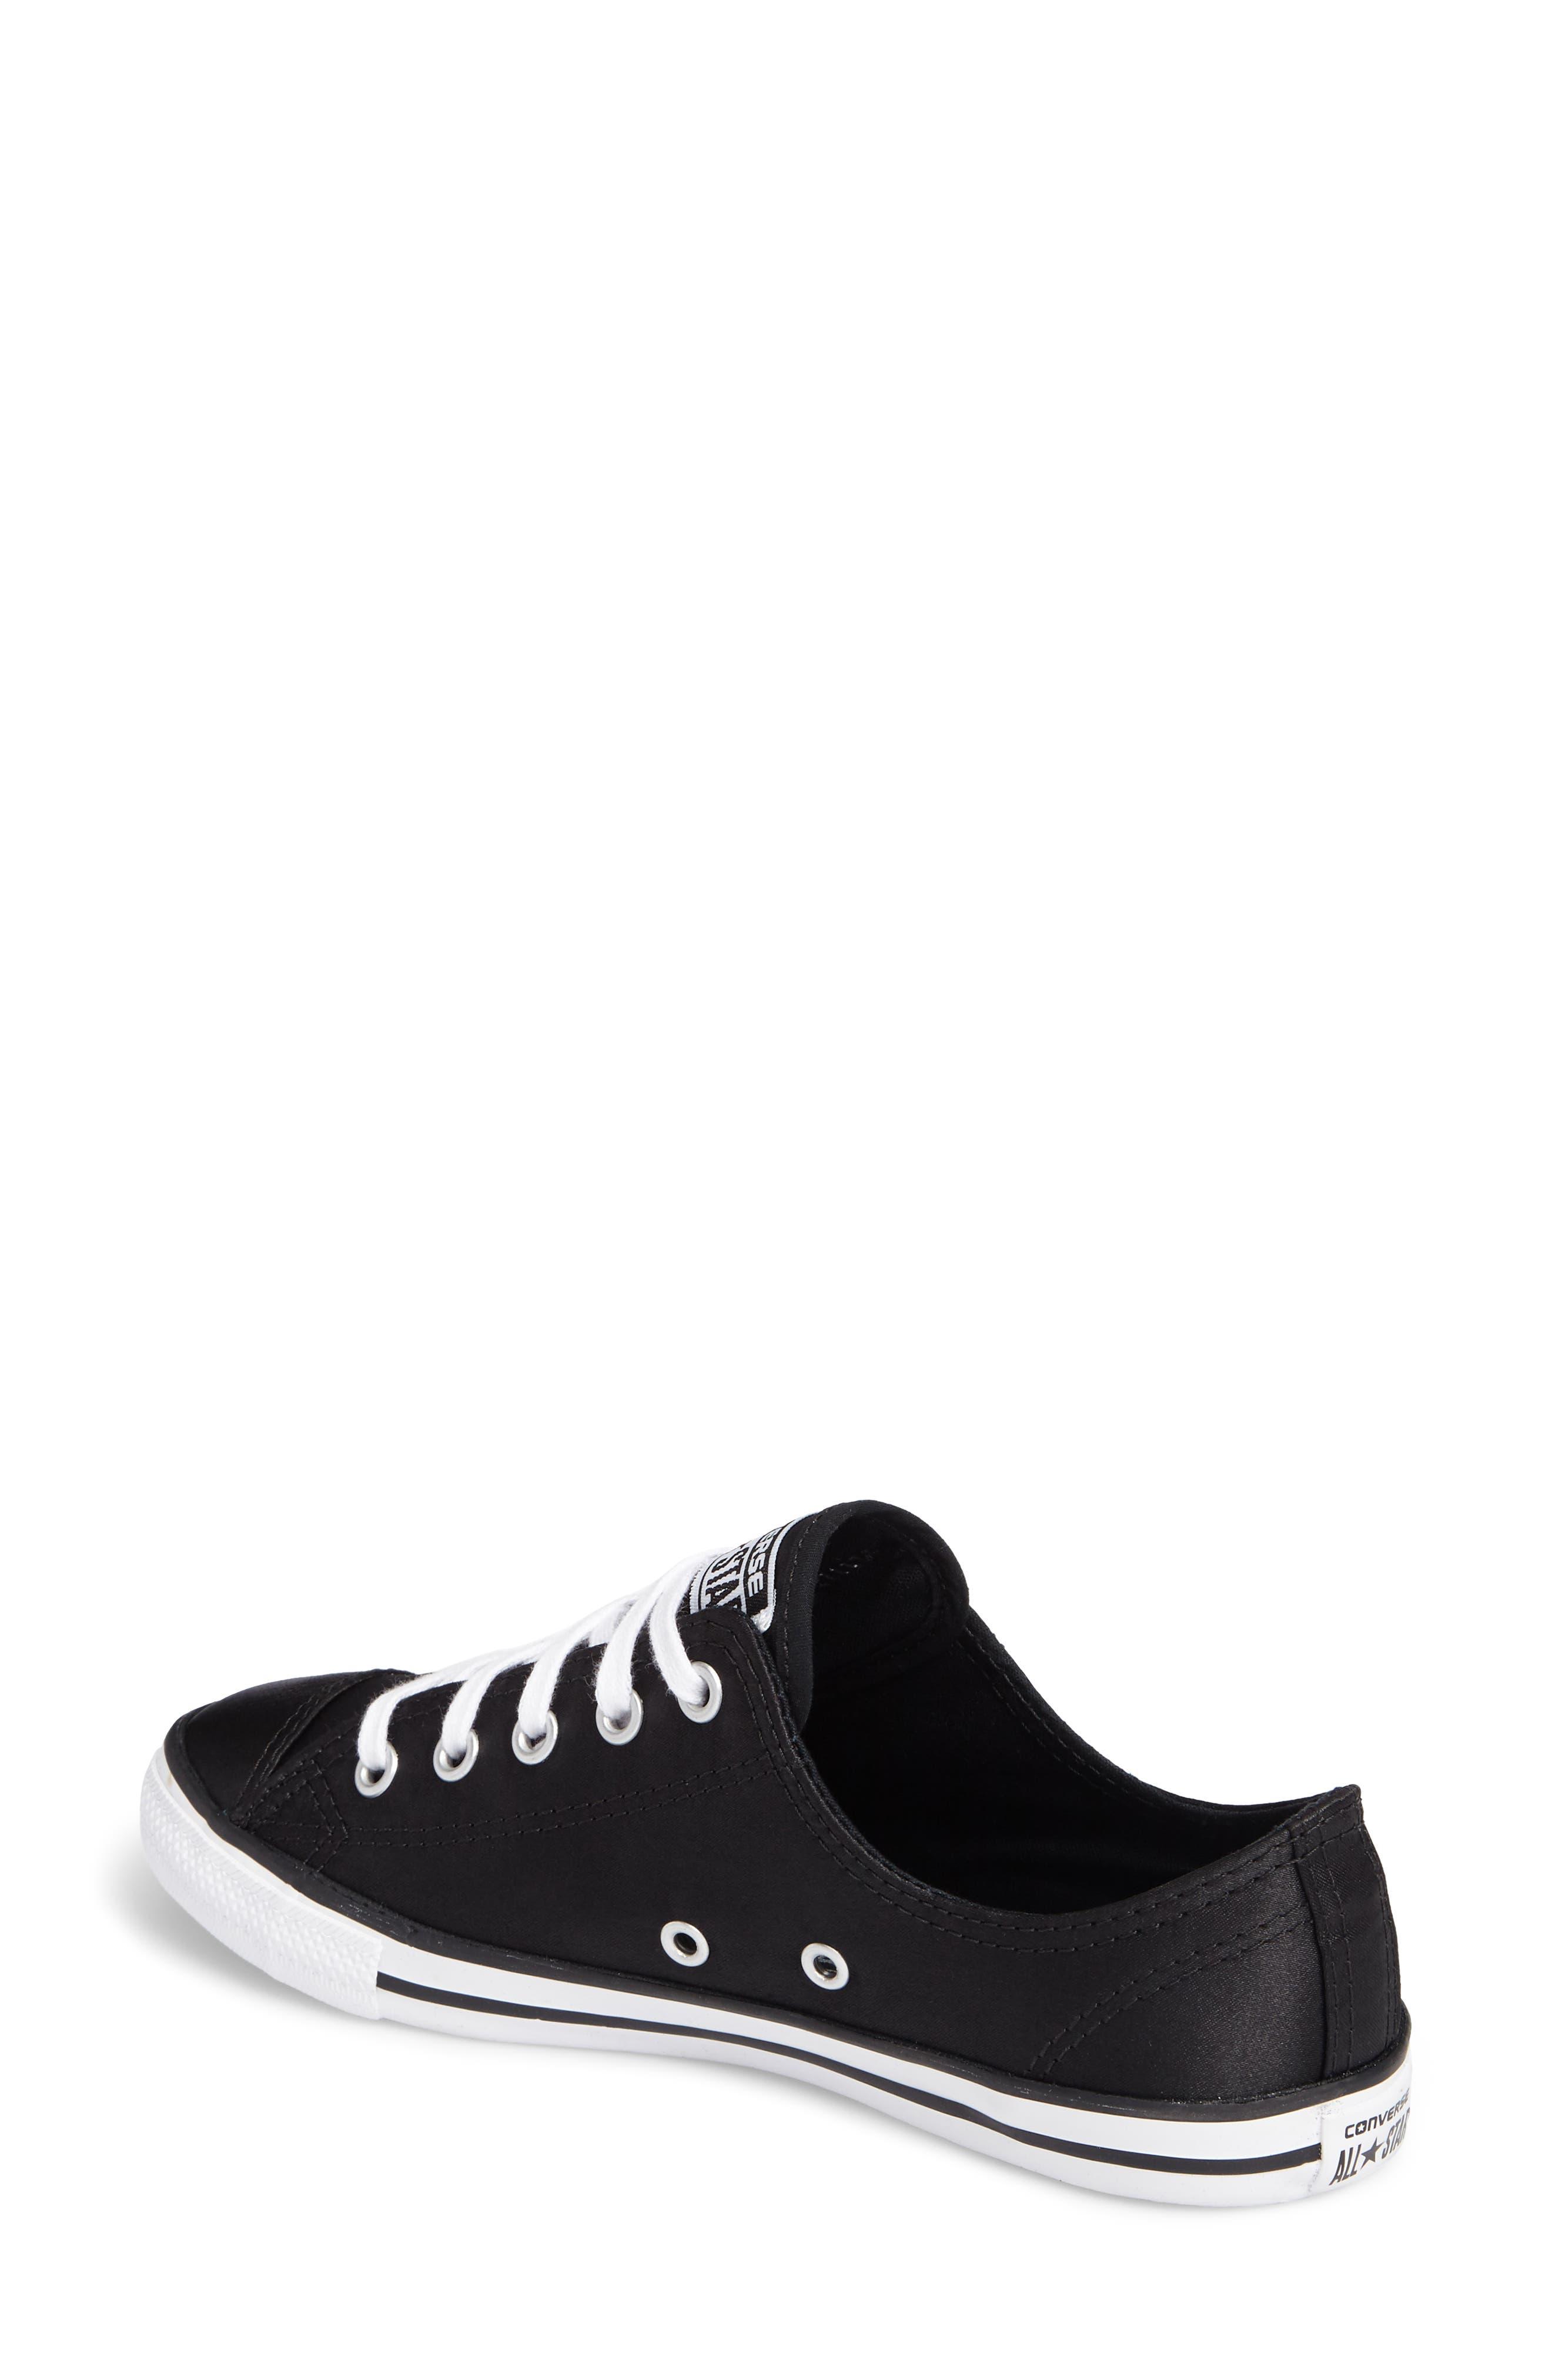 Alternate Image 2  - Converse Chuck Taylor® All Star® 'Dainty' Low Top Sneaker (Women)